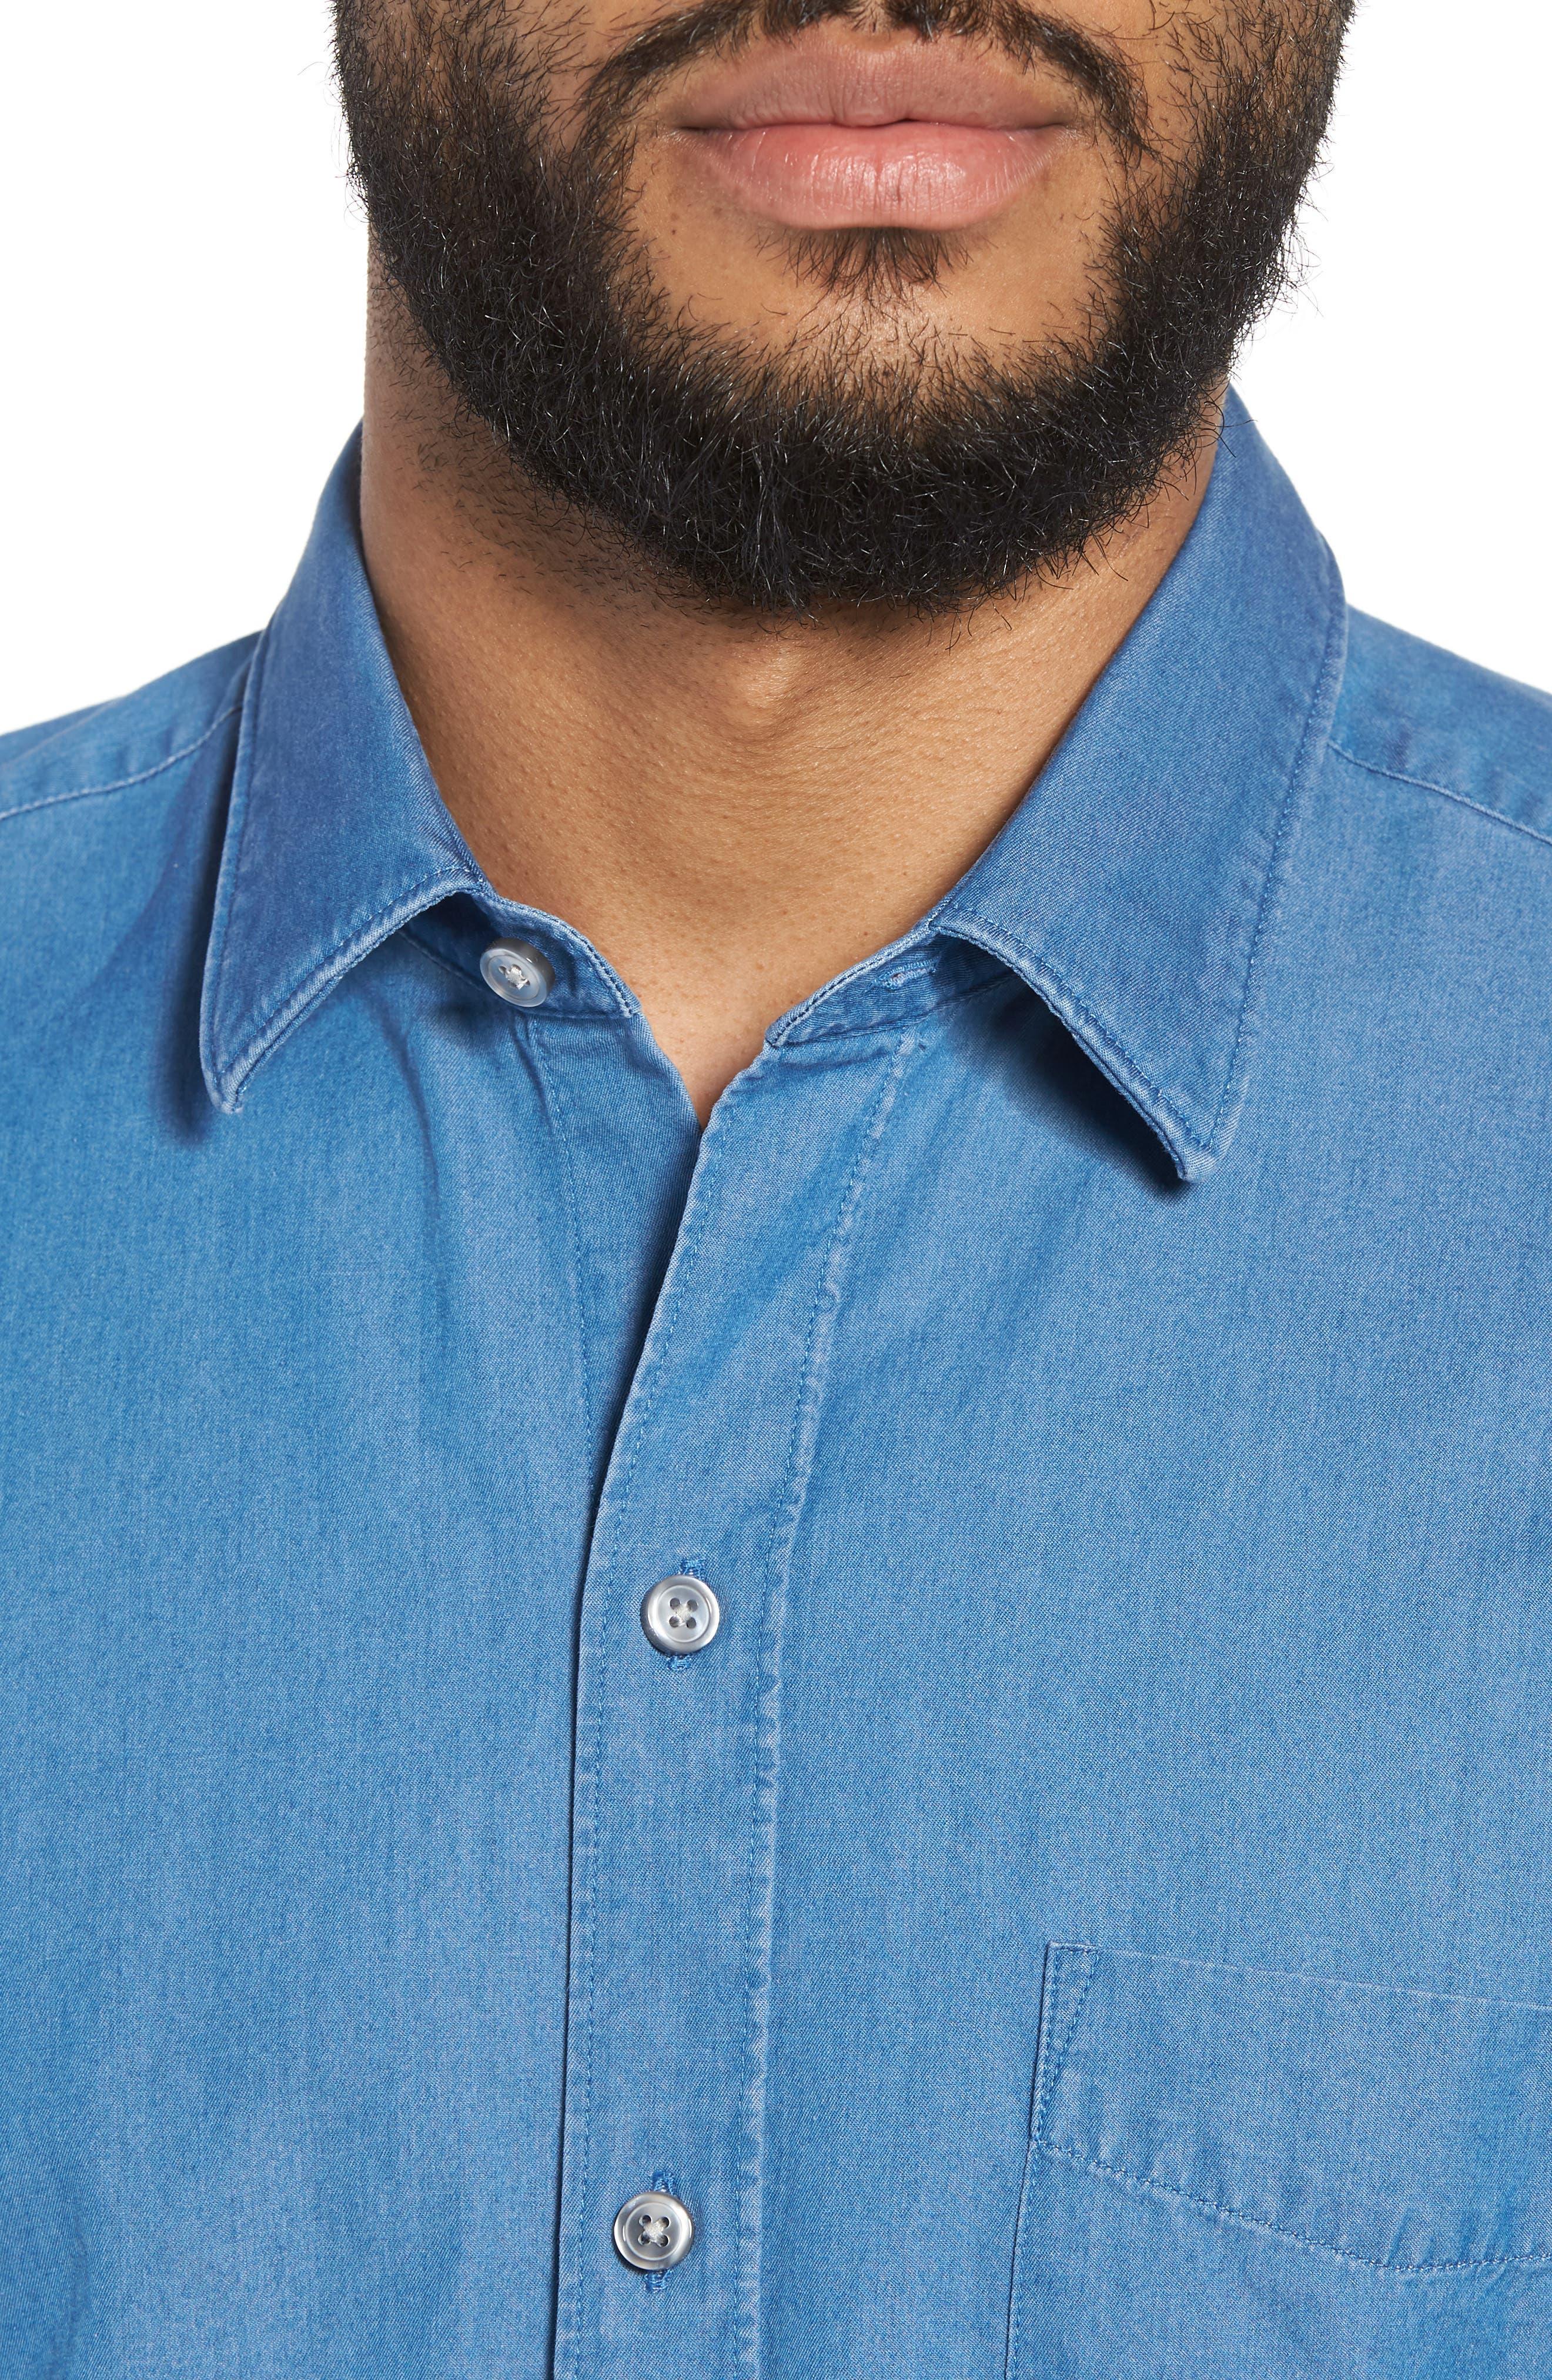 Robb Trim Fit Denim Short Sleeve Sport Shirt,                             Alternate thumbnail 4, color,                             Blue